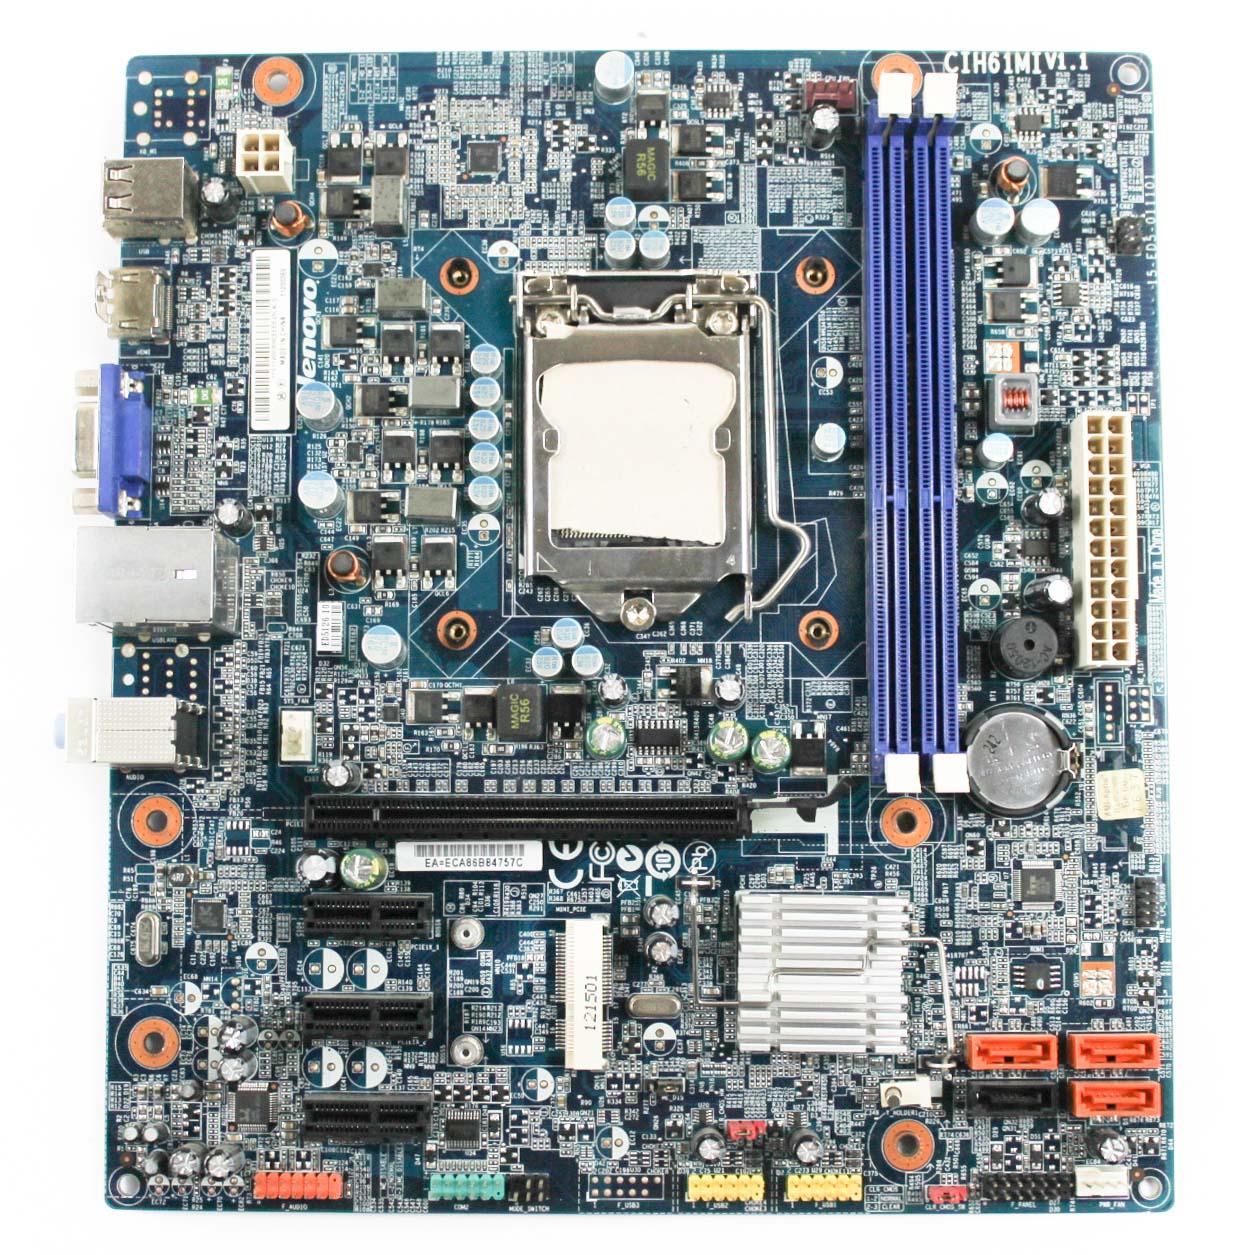 11200369 Lenovo Intel Socket LGA1155 Motherboard - CIH61MI V1.1